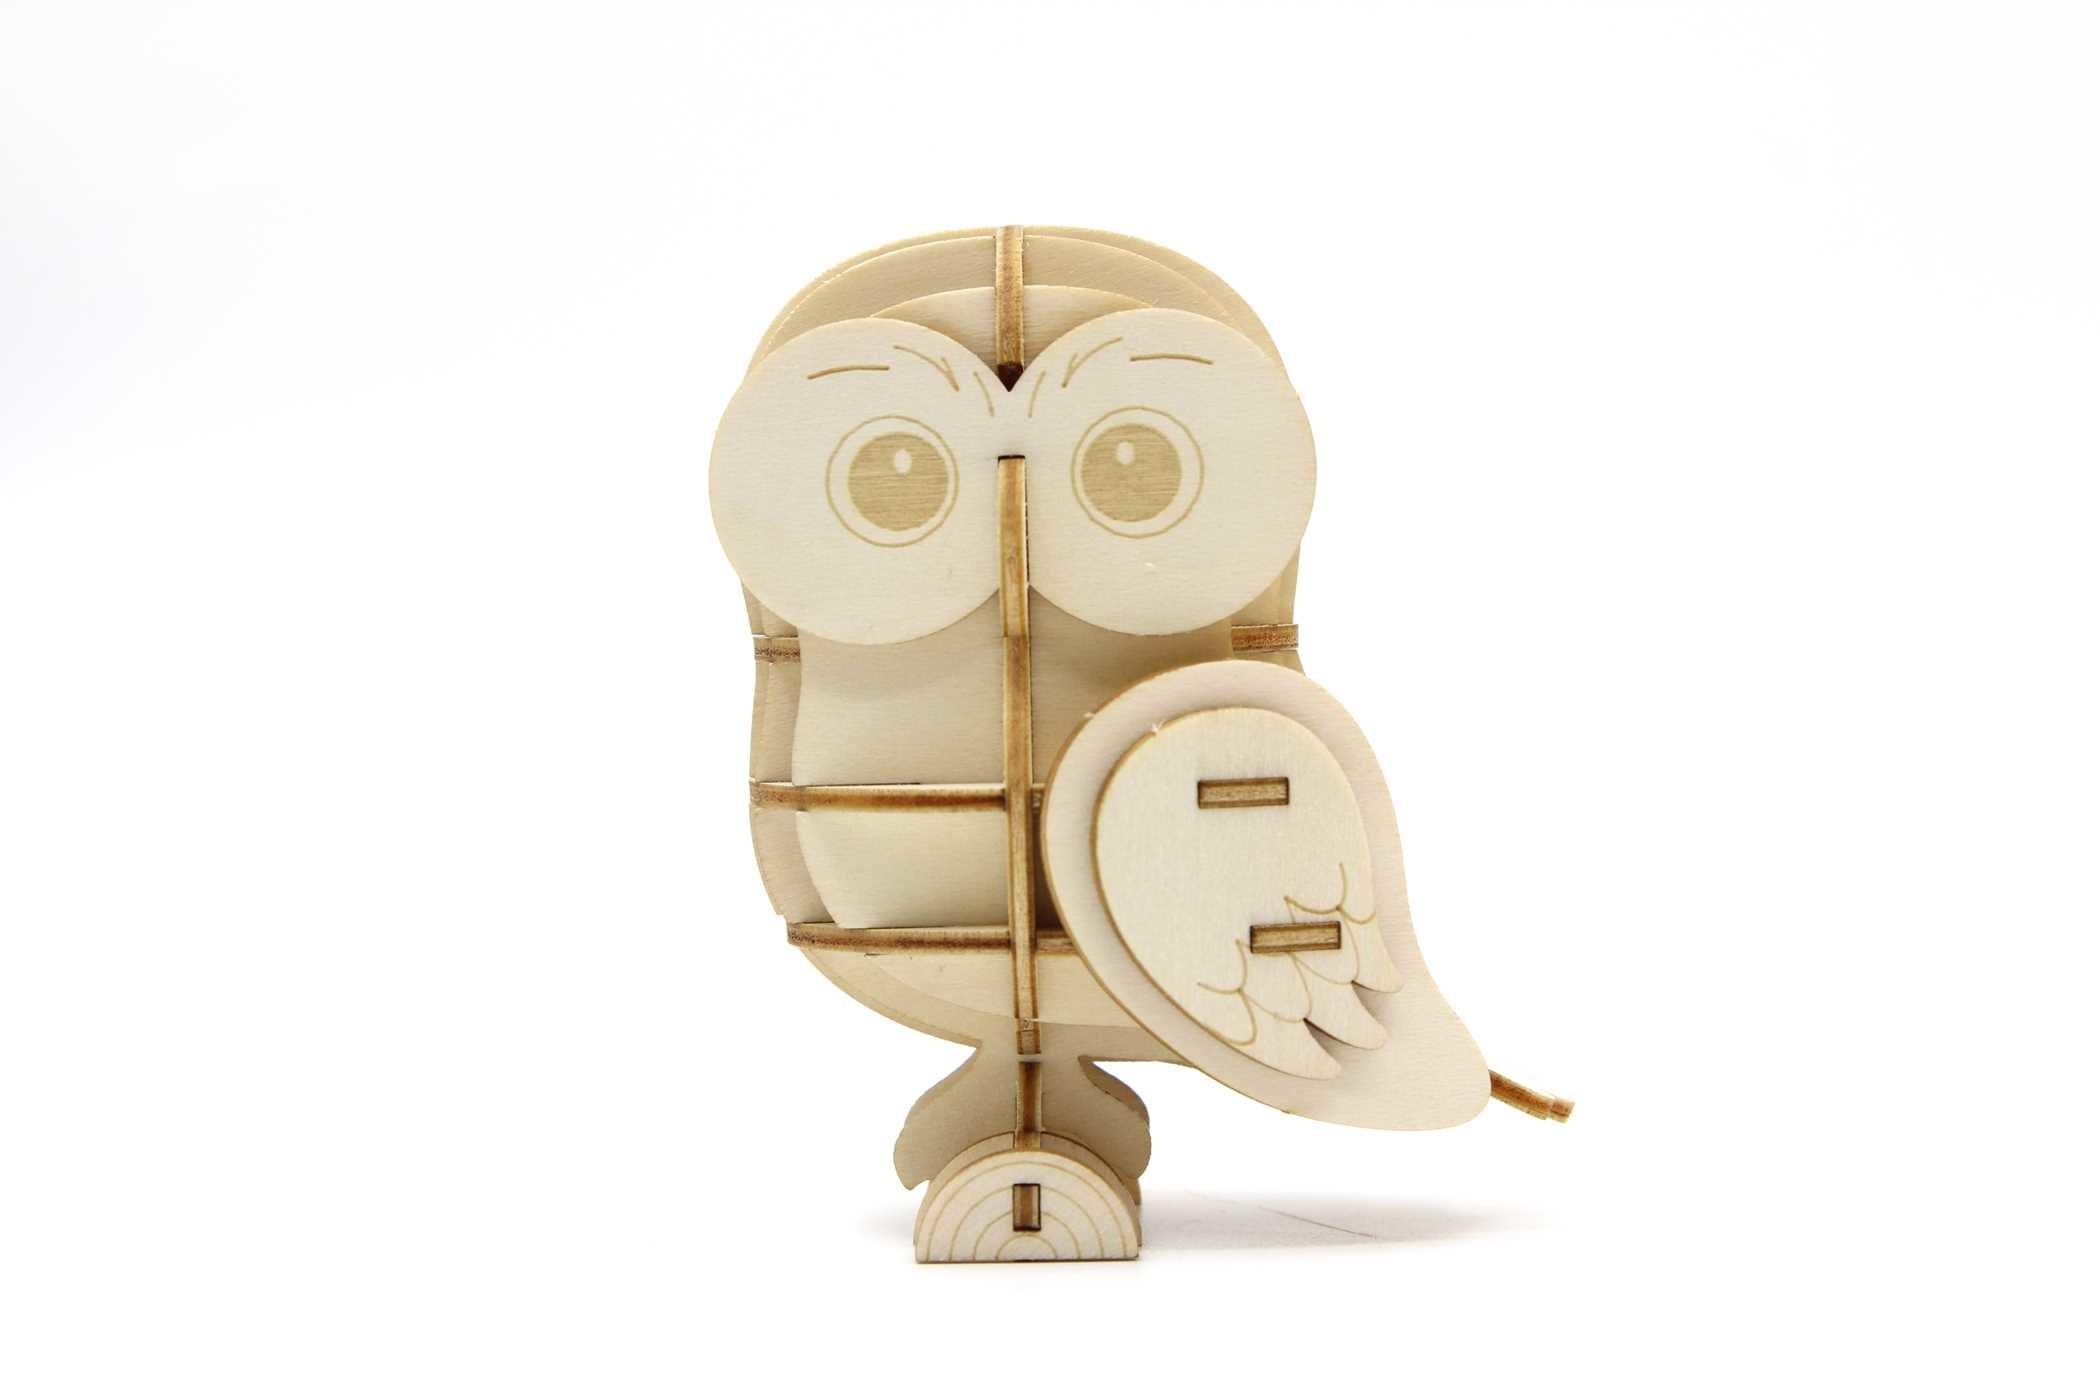 Incredibuilds owl 3d wood model 9781682980408.in03